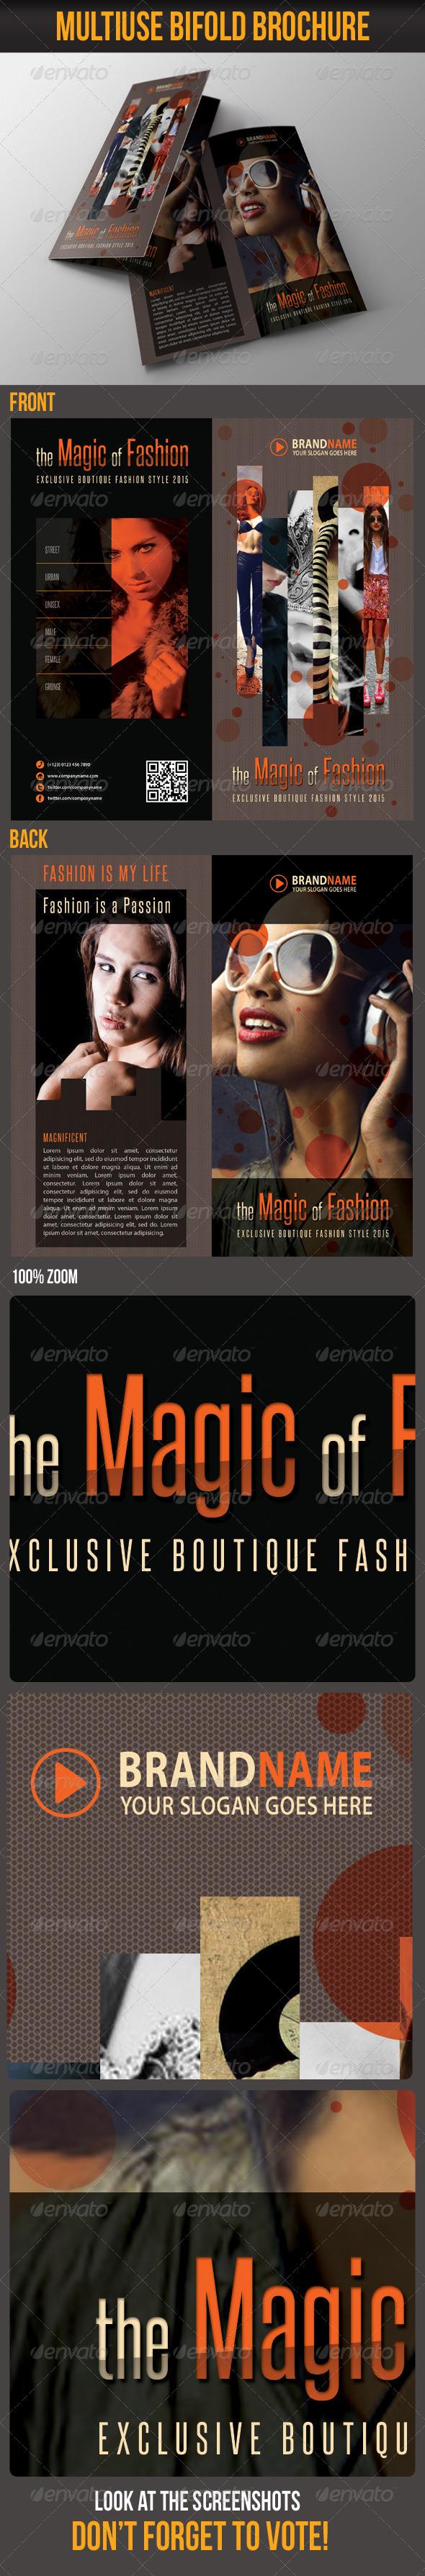 Multiuse Bifold Brochure 26 - Catalogs Brochures